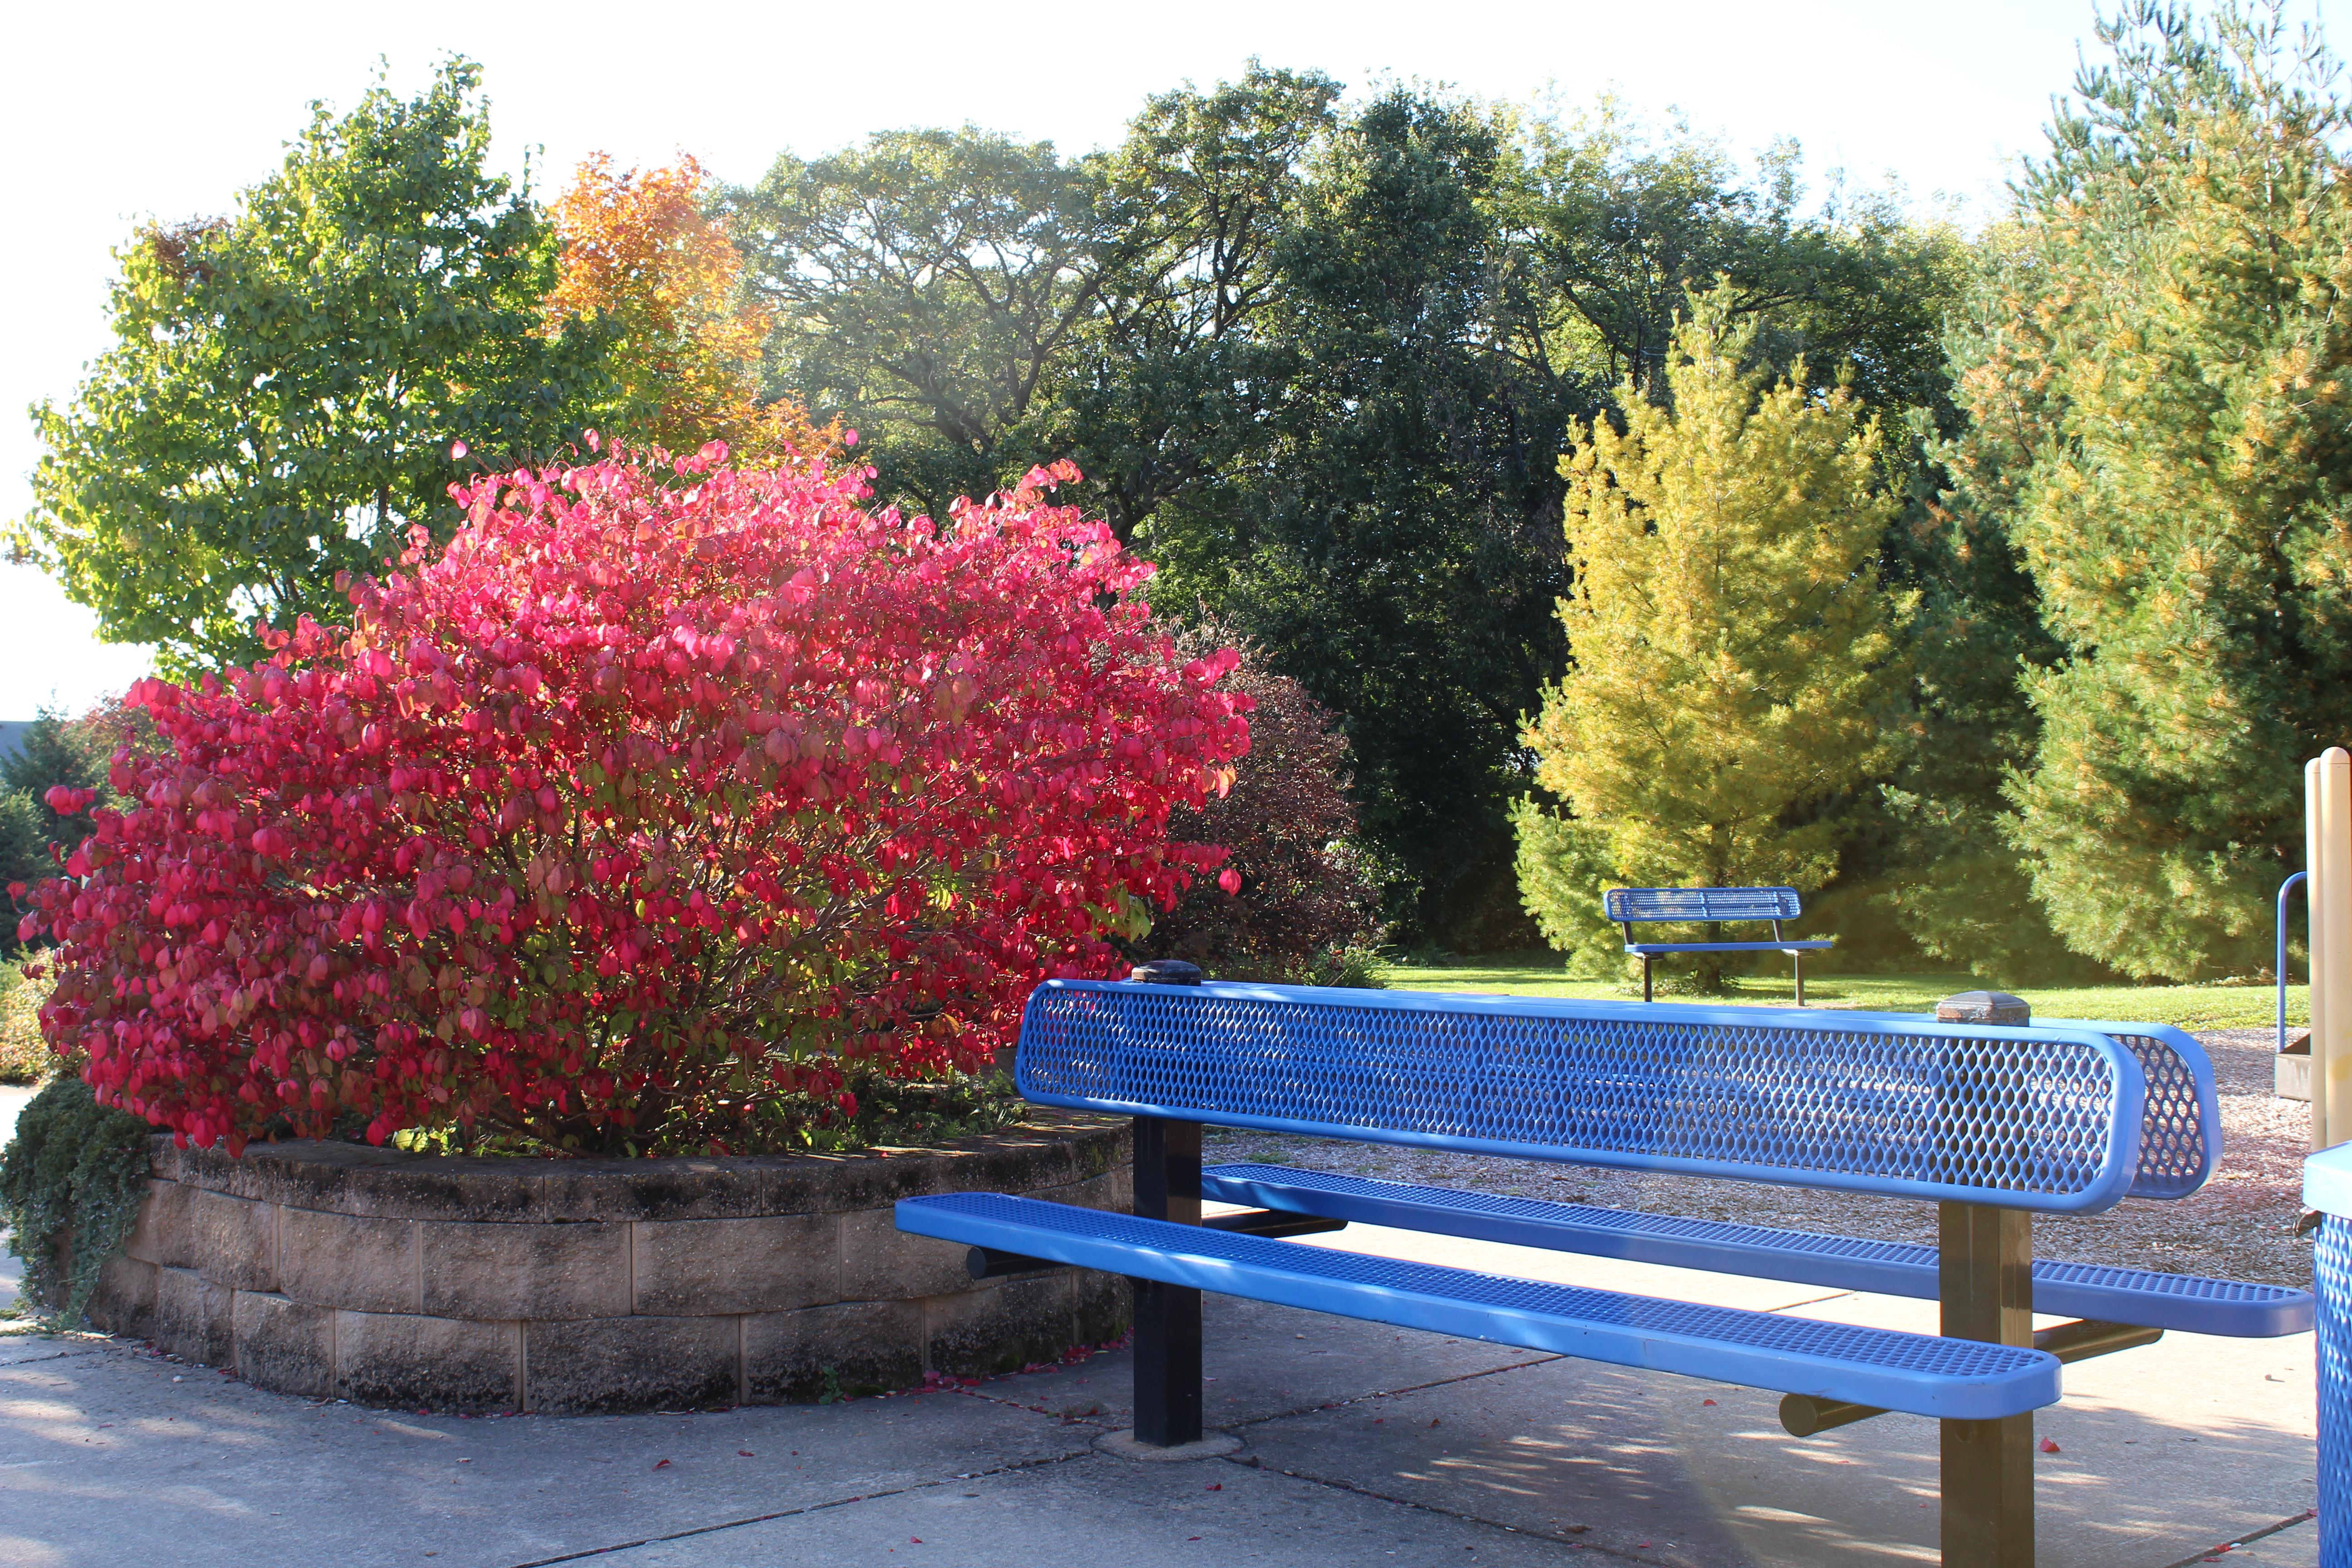 Sheehan Park Master Plan:  Community Recreation Center